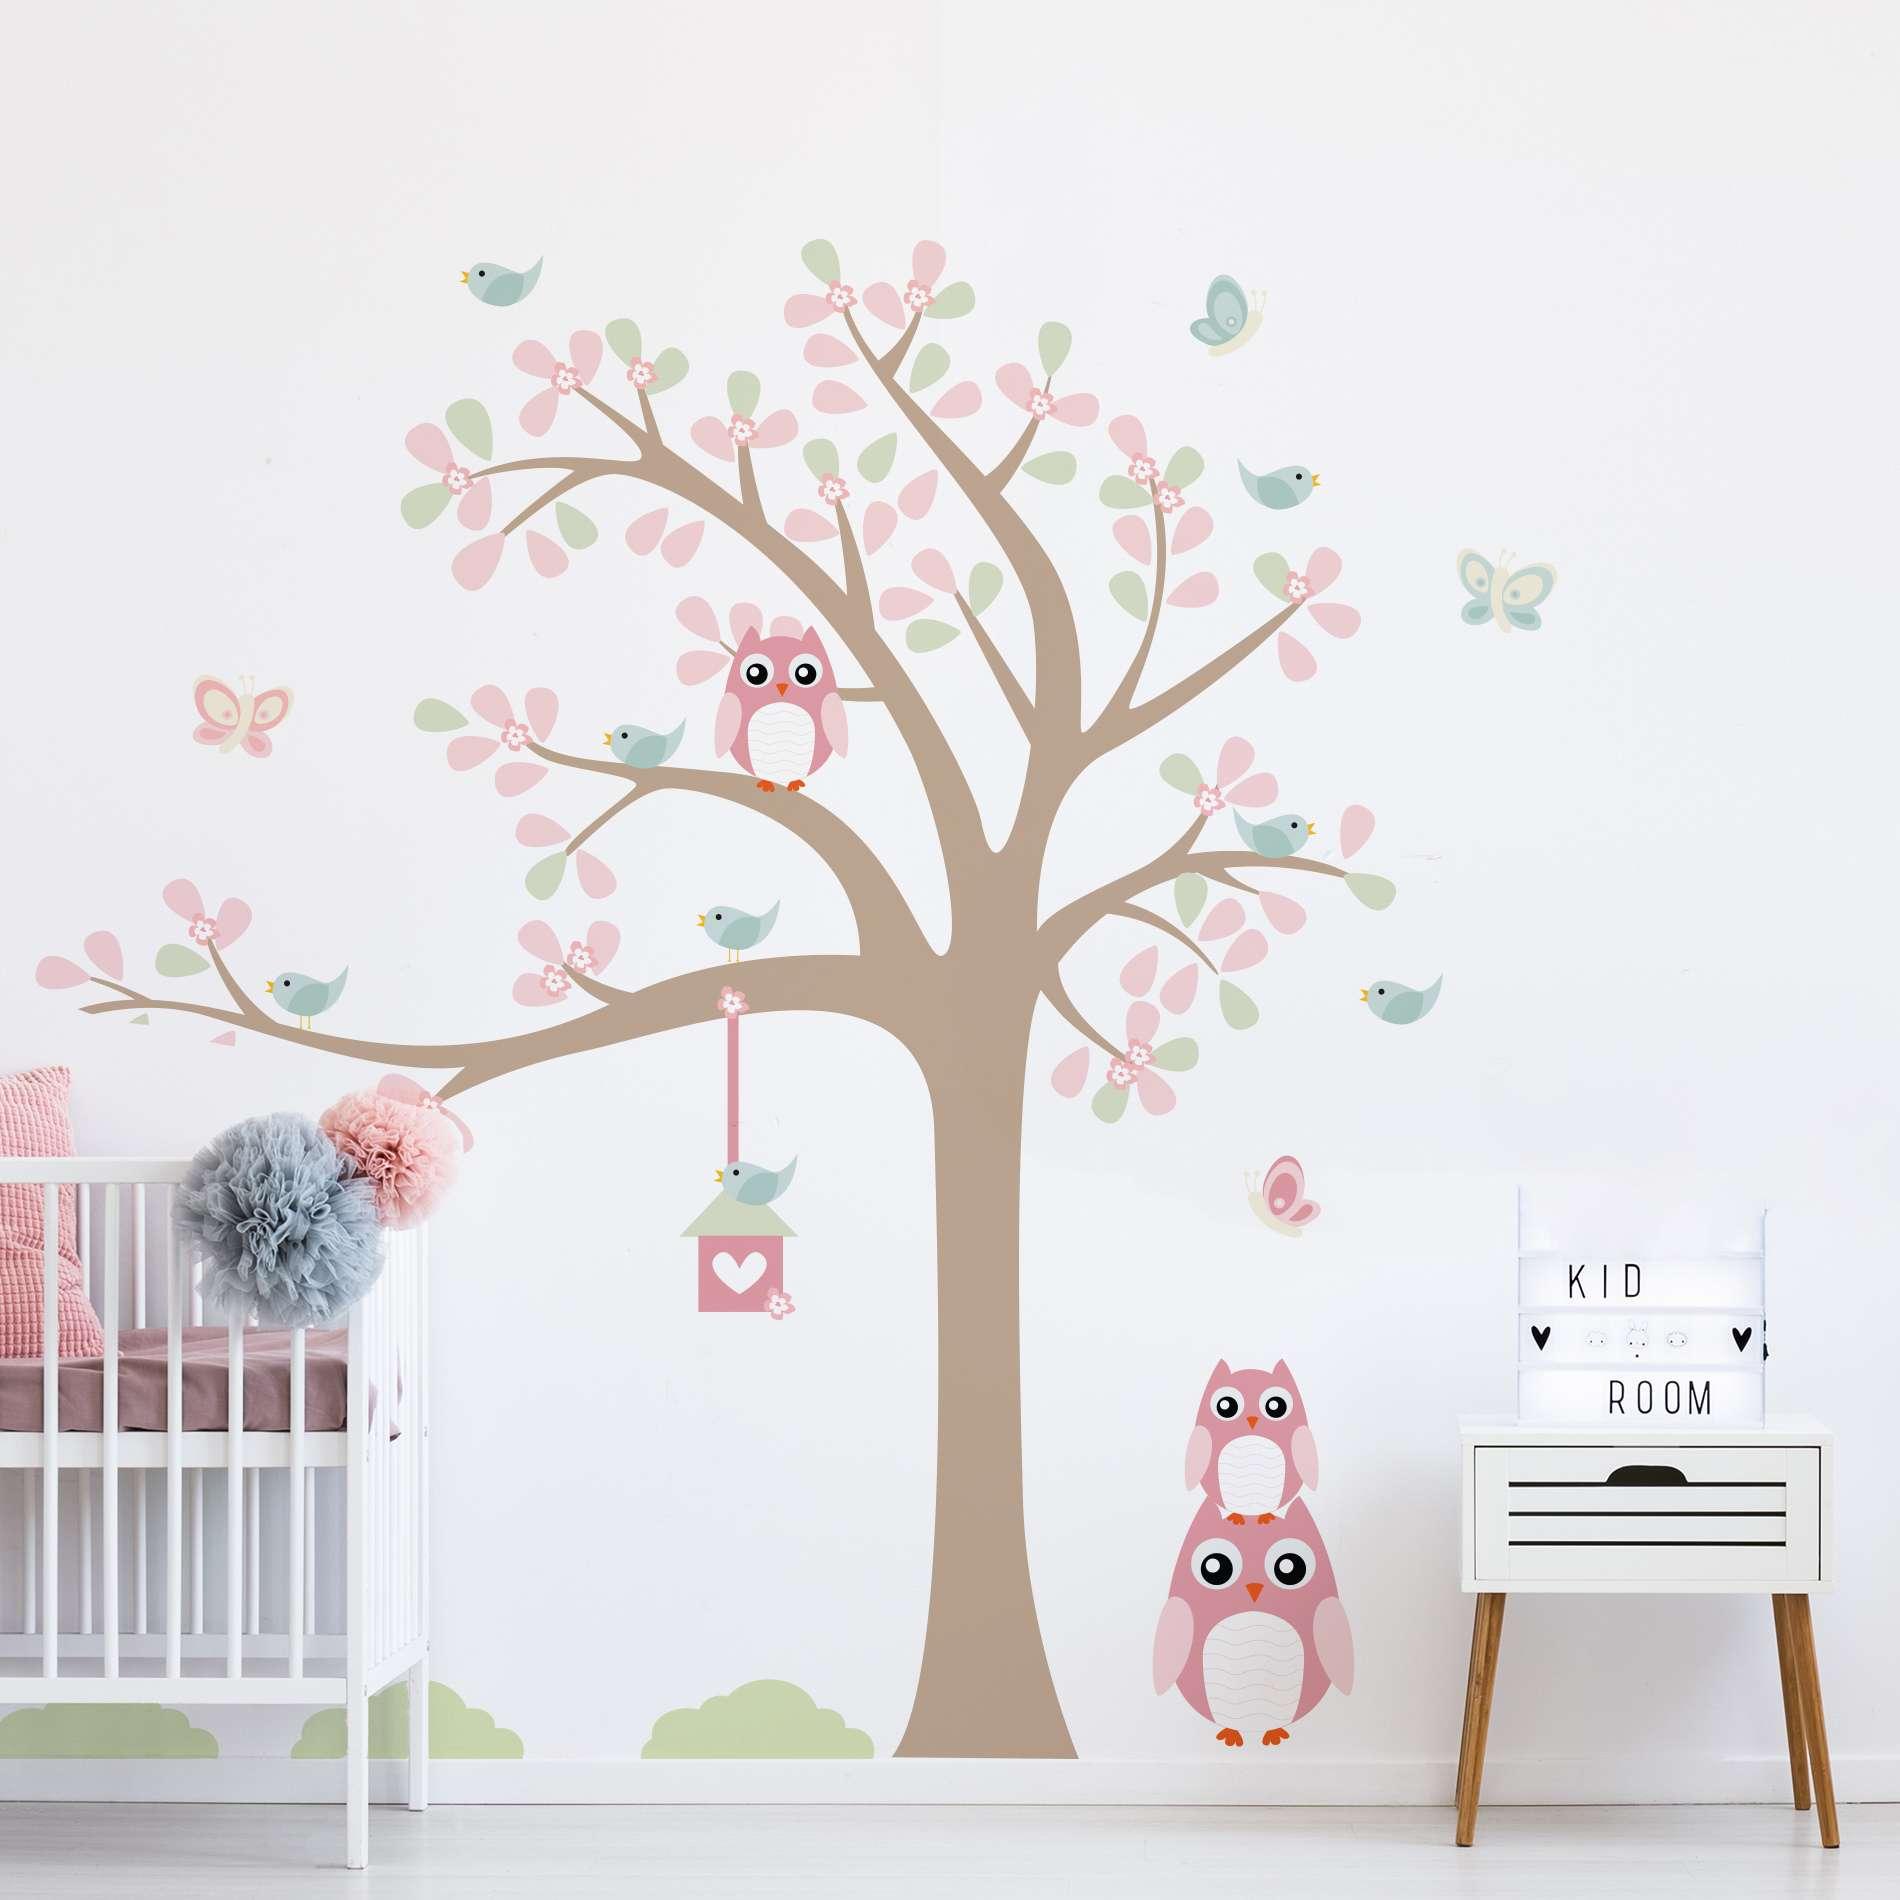 ffde7de68 Adesivo de Parede Infantil Árvore Baby Coruja